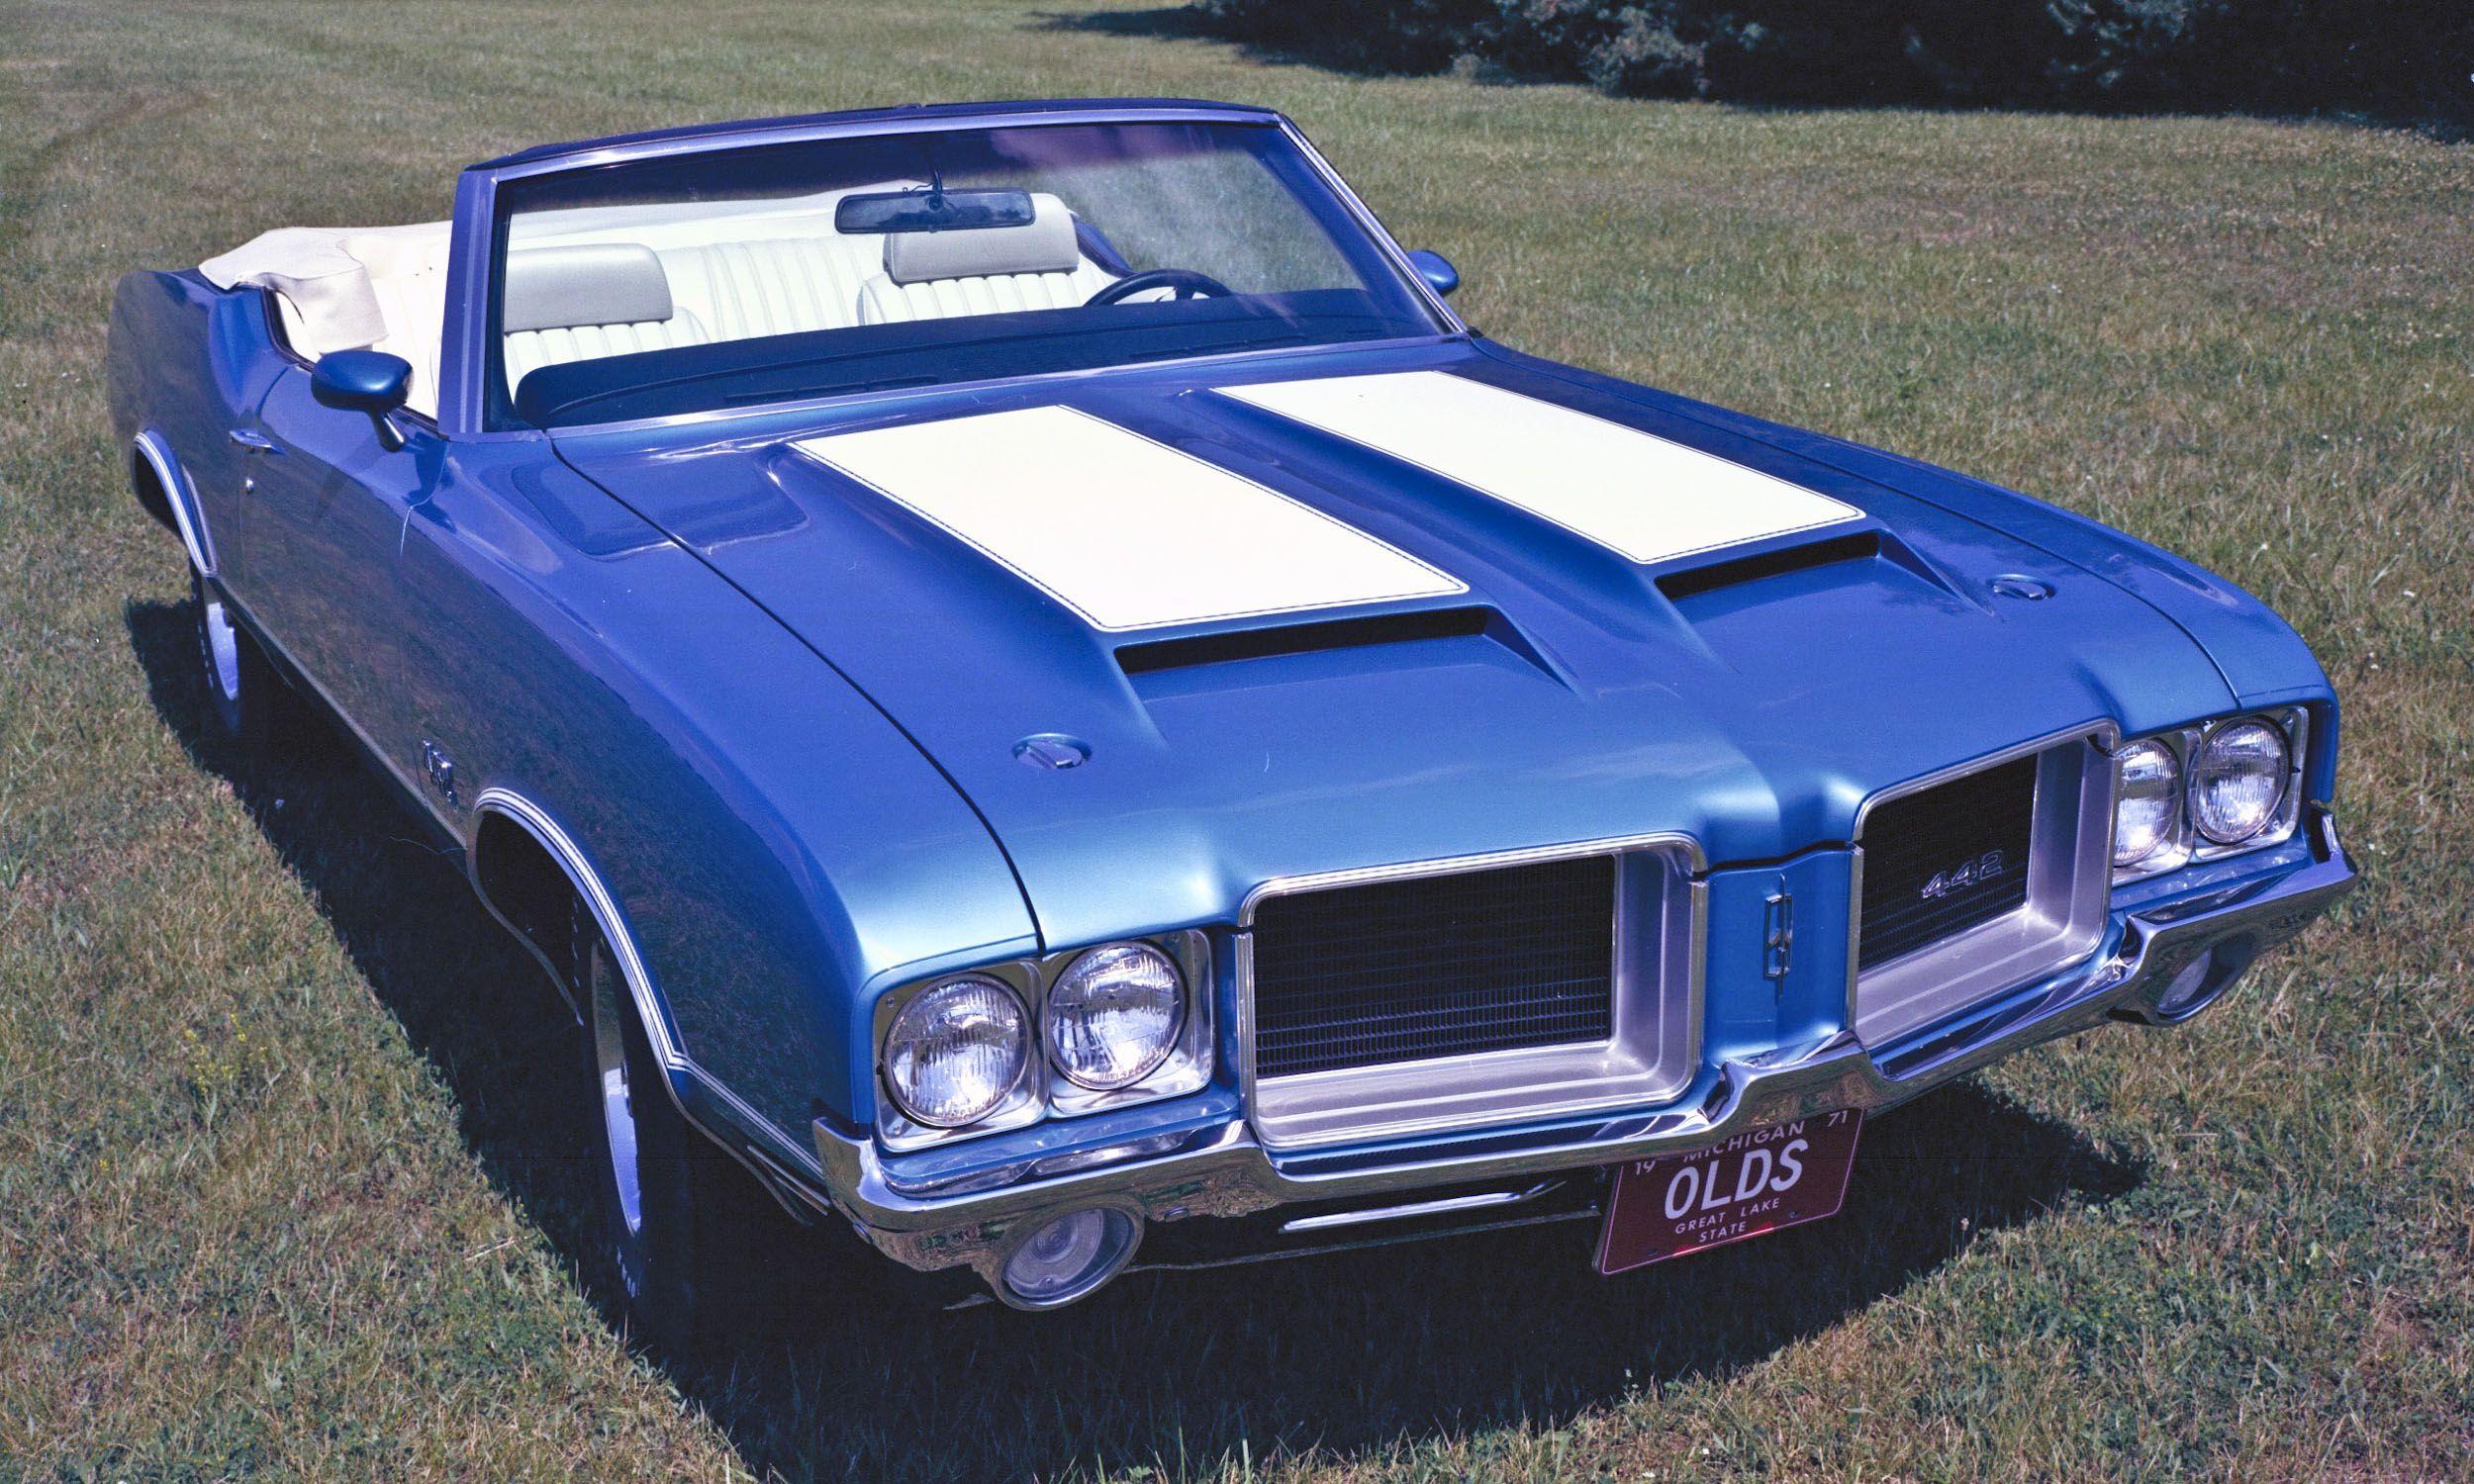 Classic Collectible Convertibles Cars That Suit Me Cars Antique